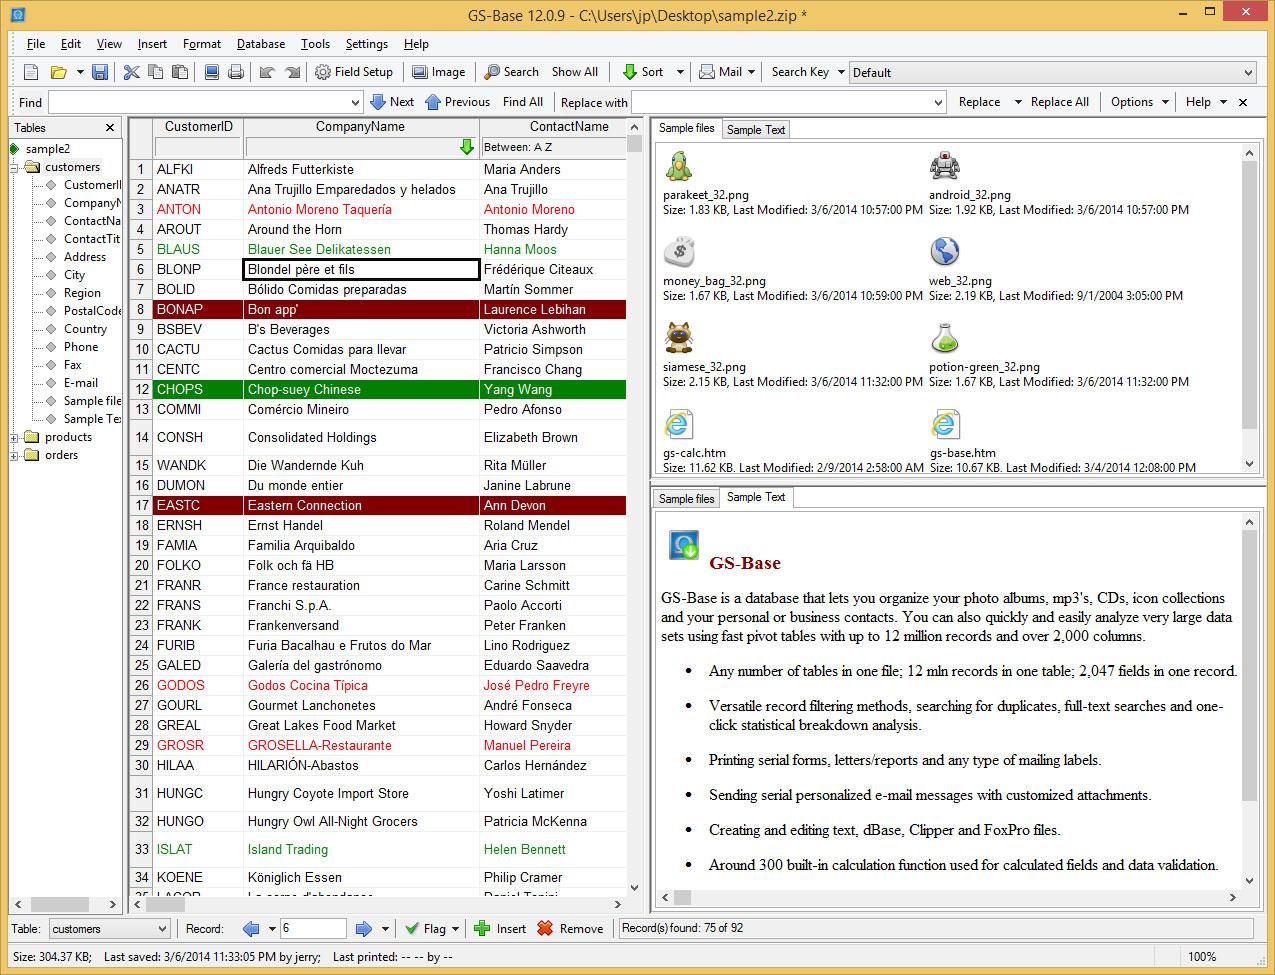 GS-Base Screenshot